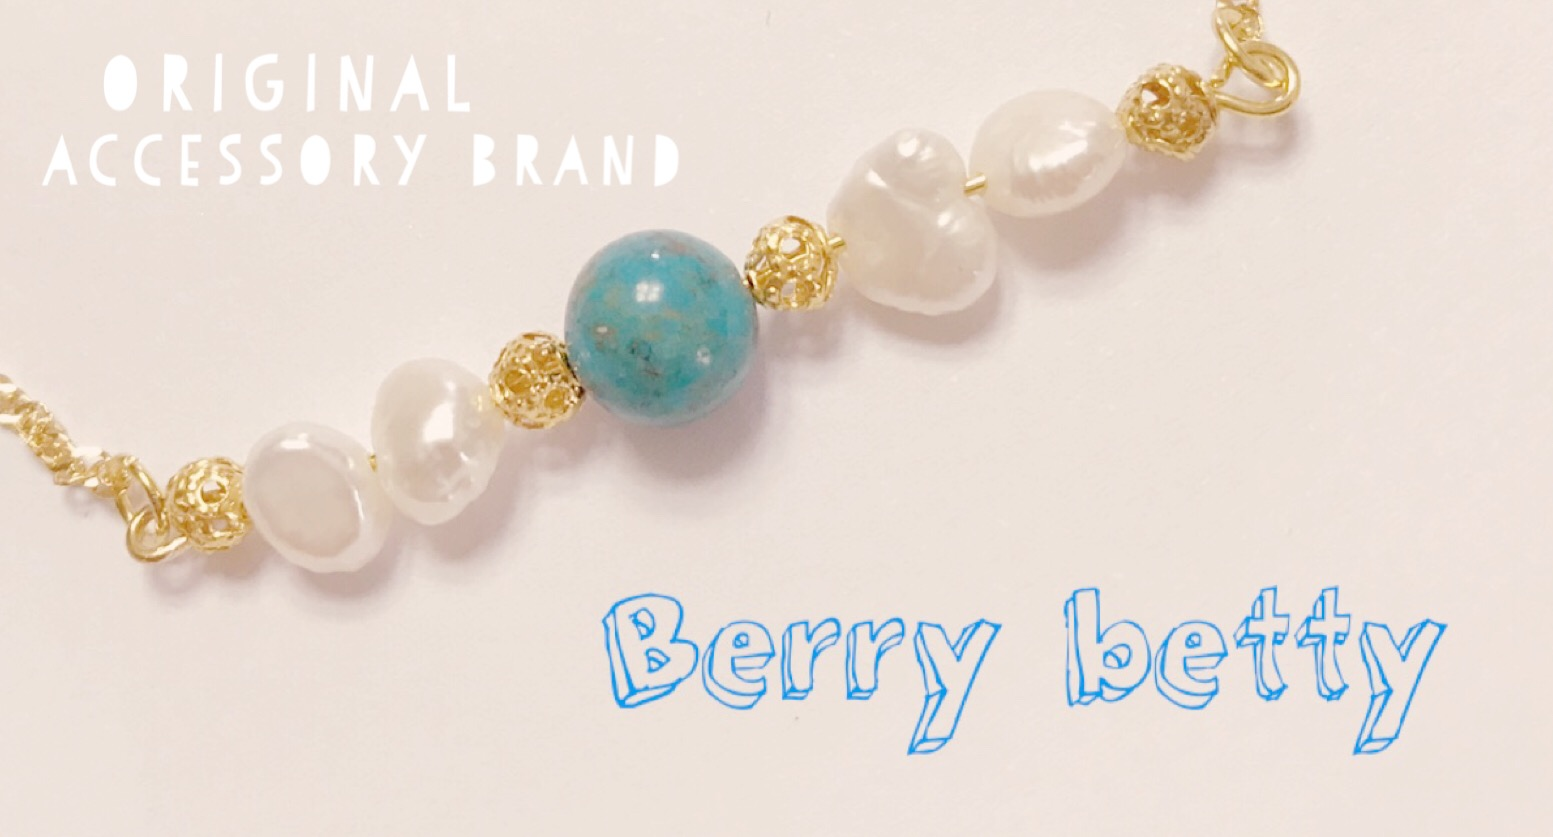 Berry betty